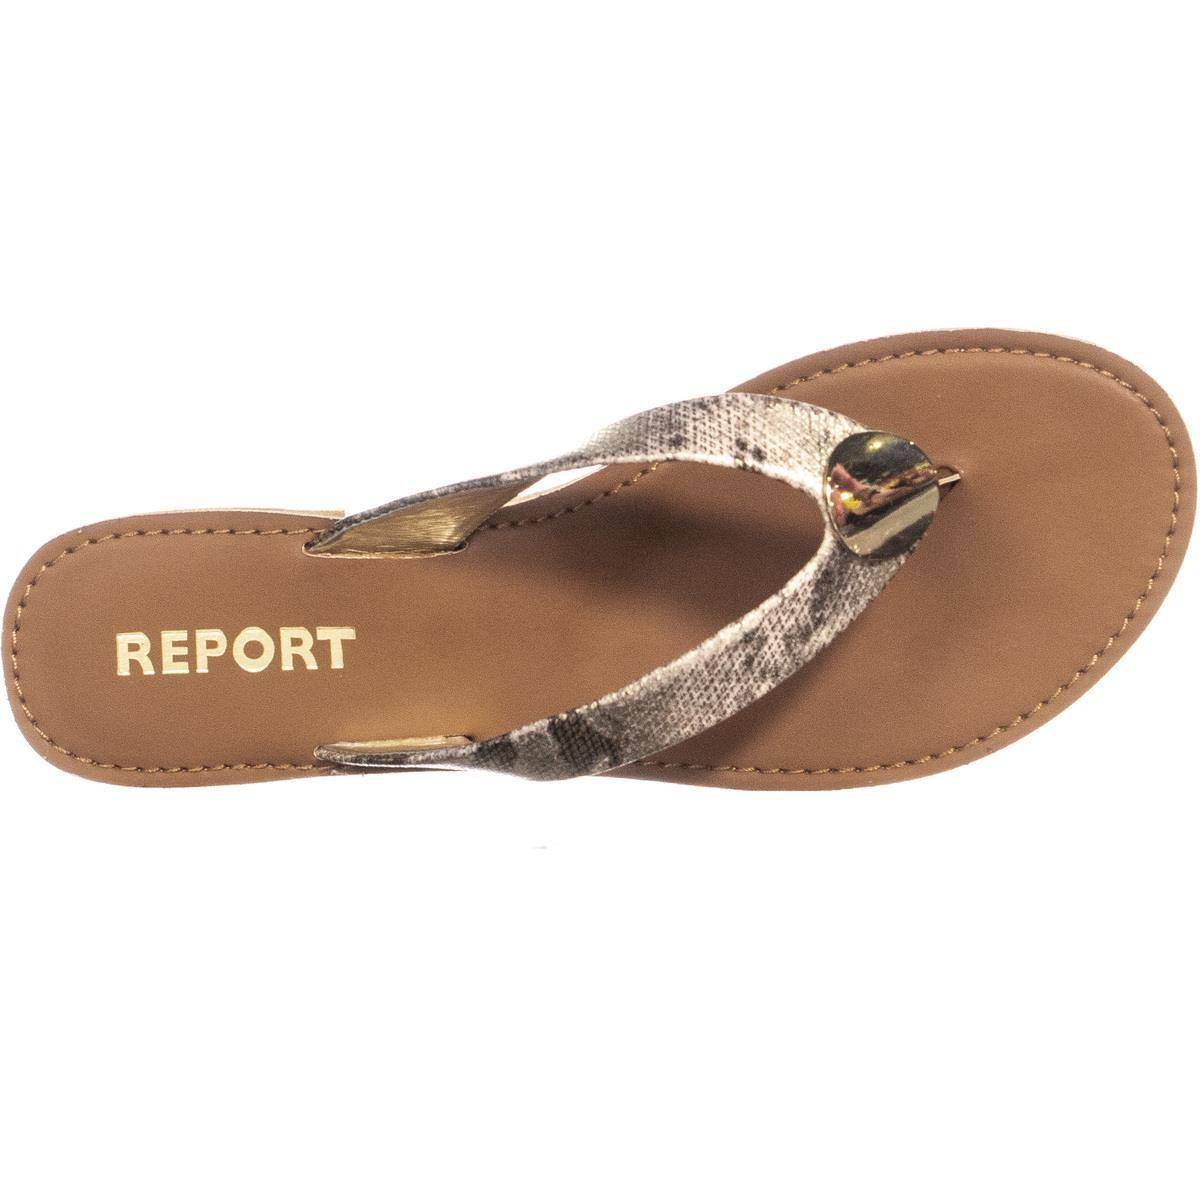 44a9fe3b9b2b Report - Multicolor Sheilds Flat Thong Flip Flops